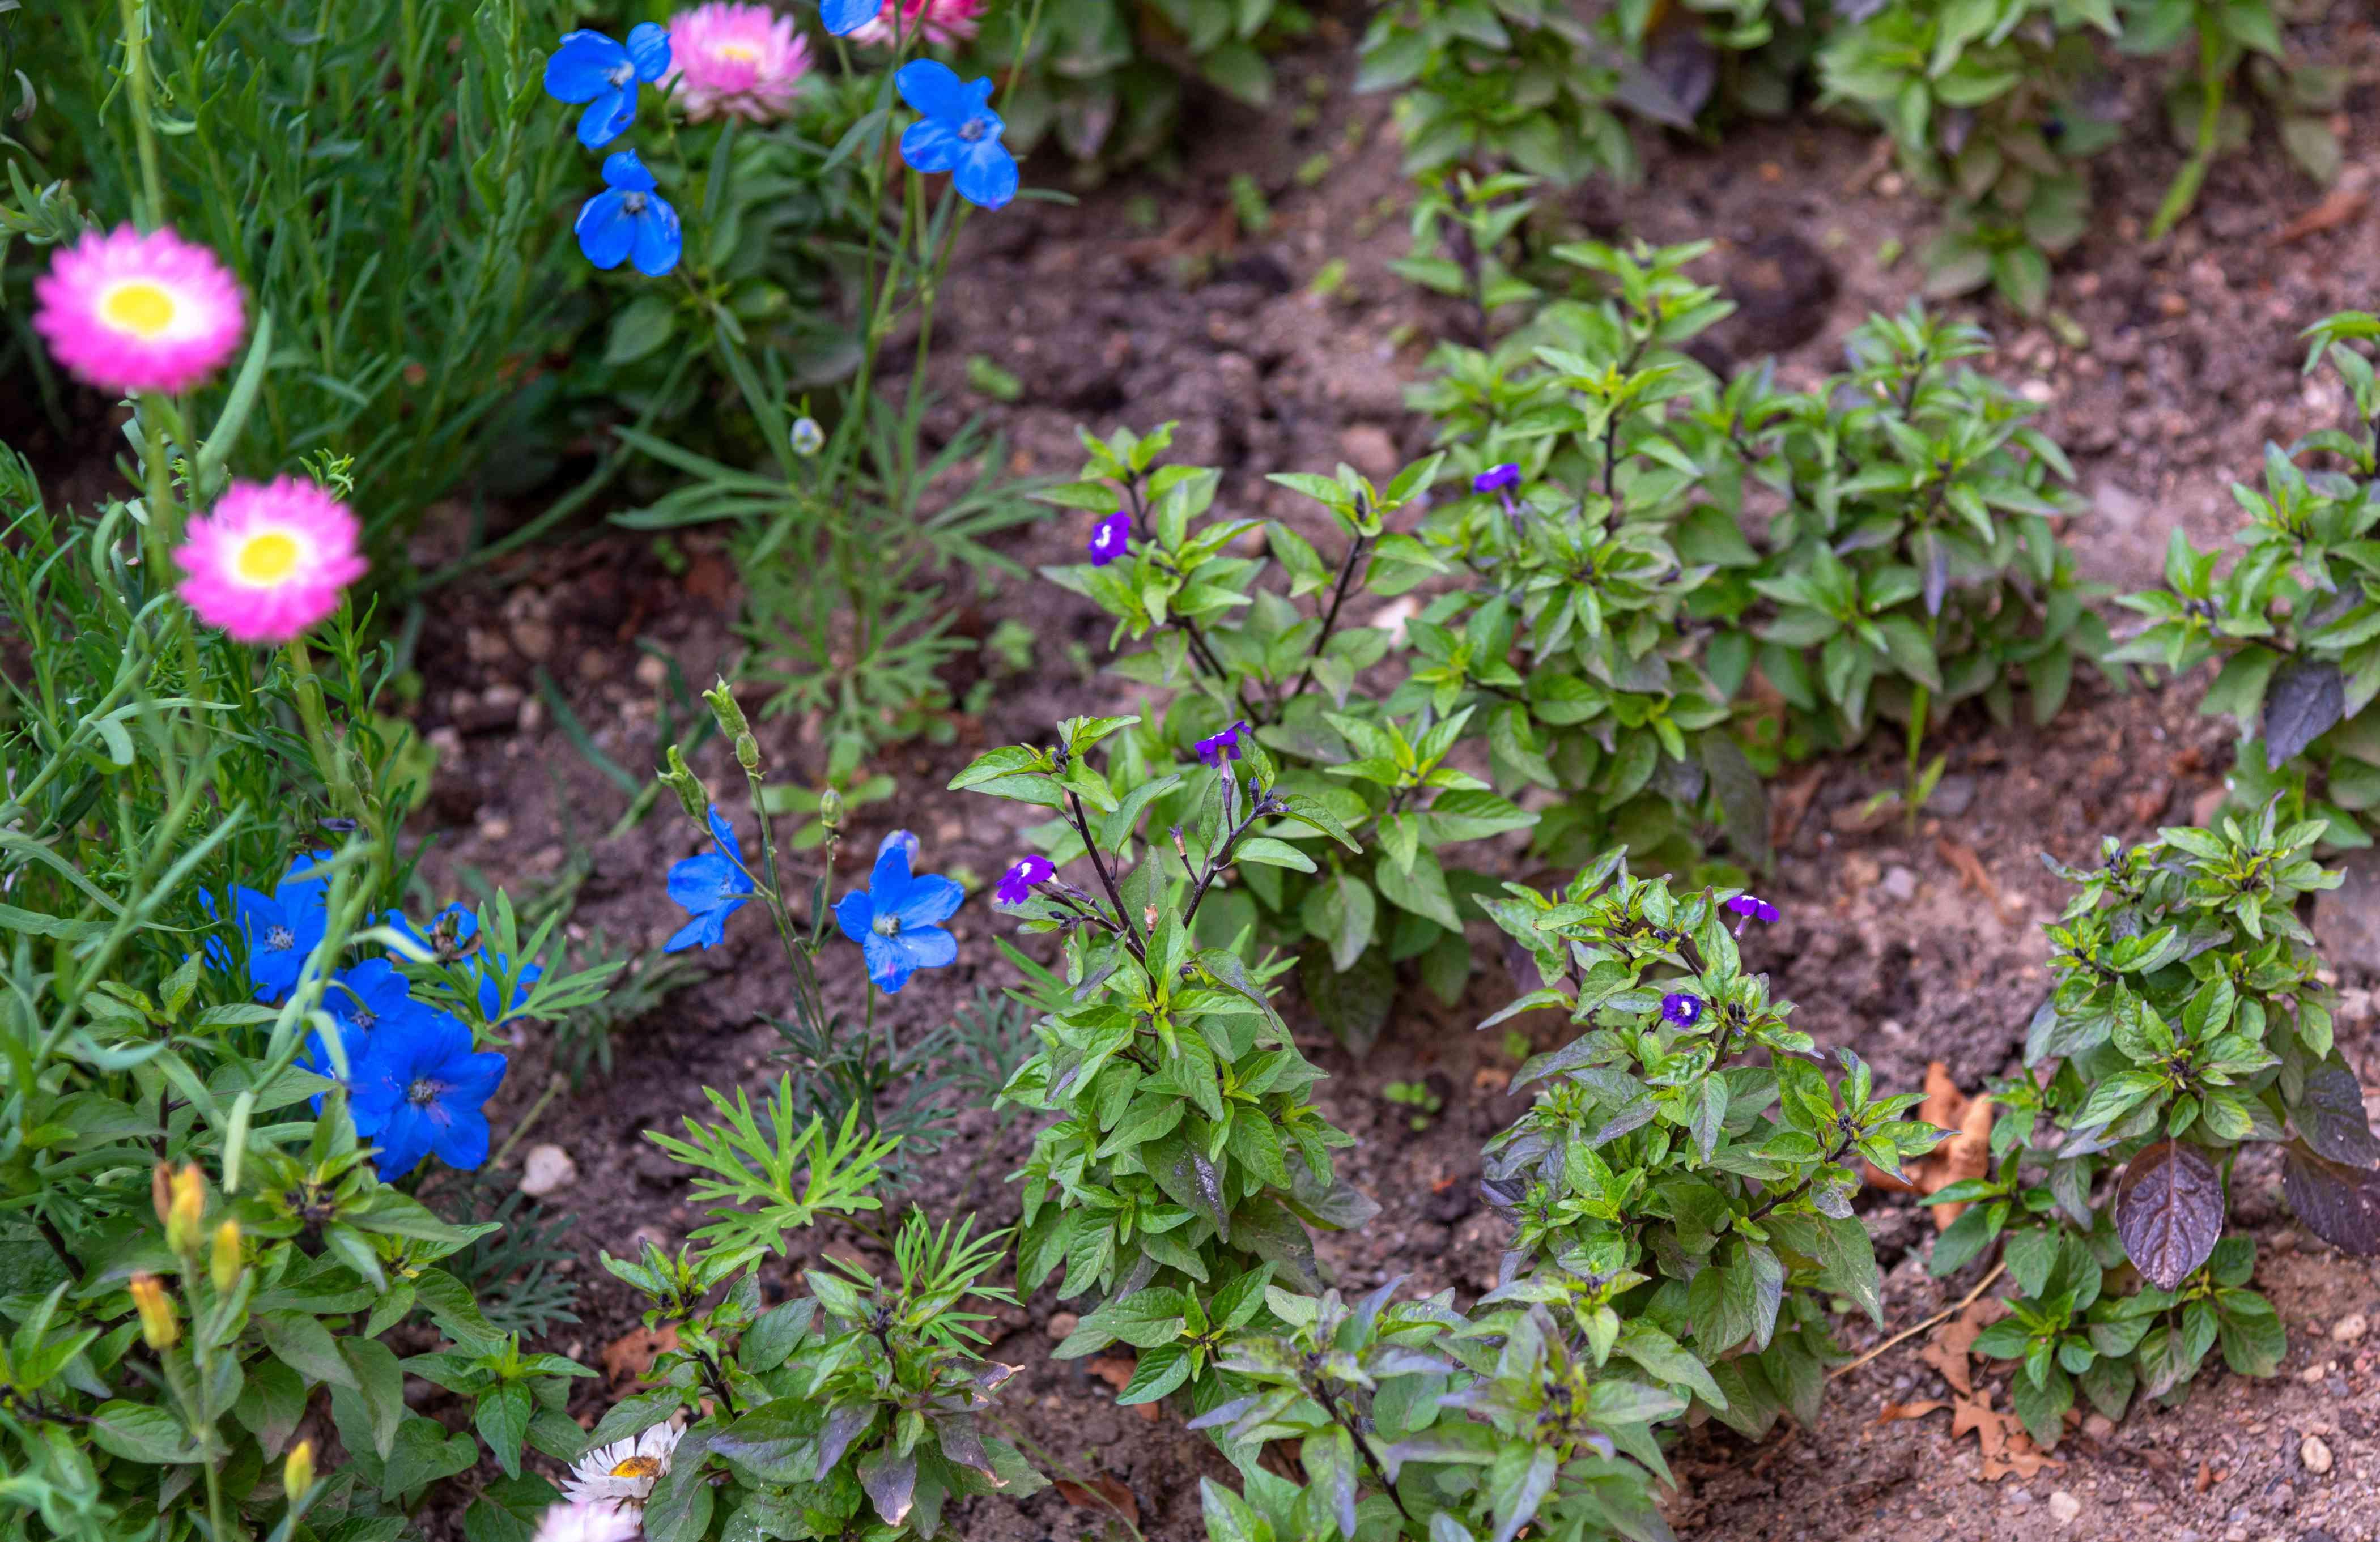 Browallia plant with small purple flowers on bush-like stems in garden